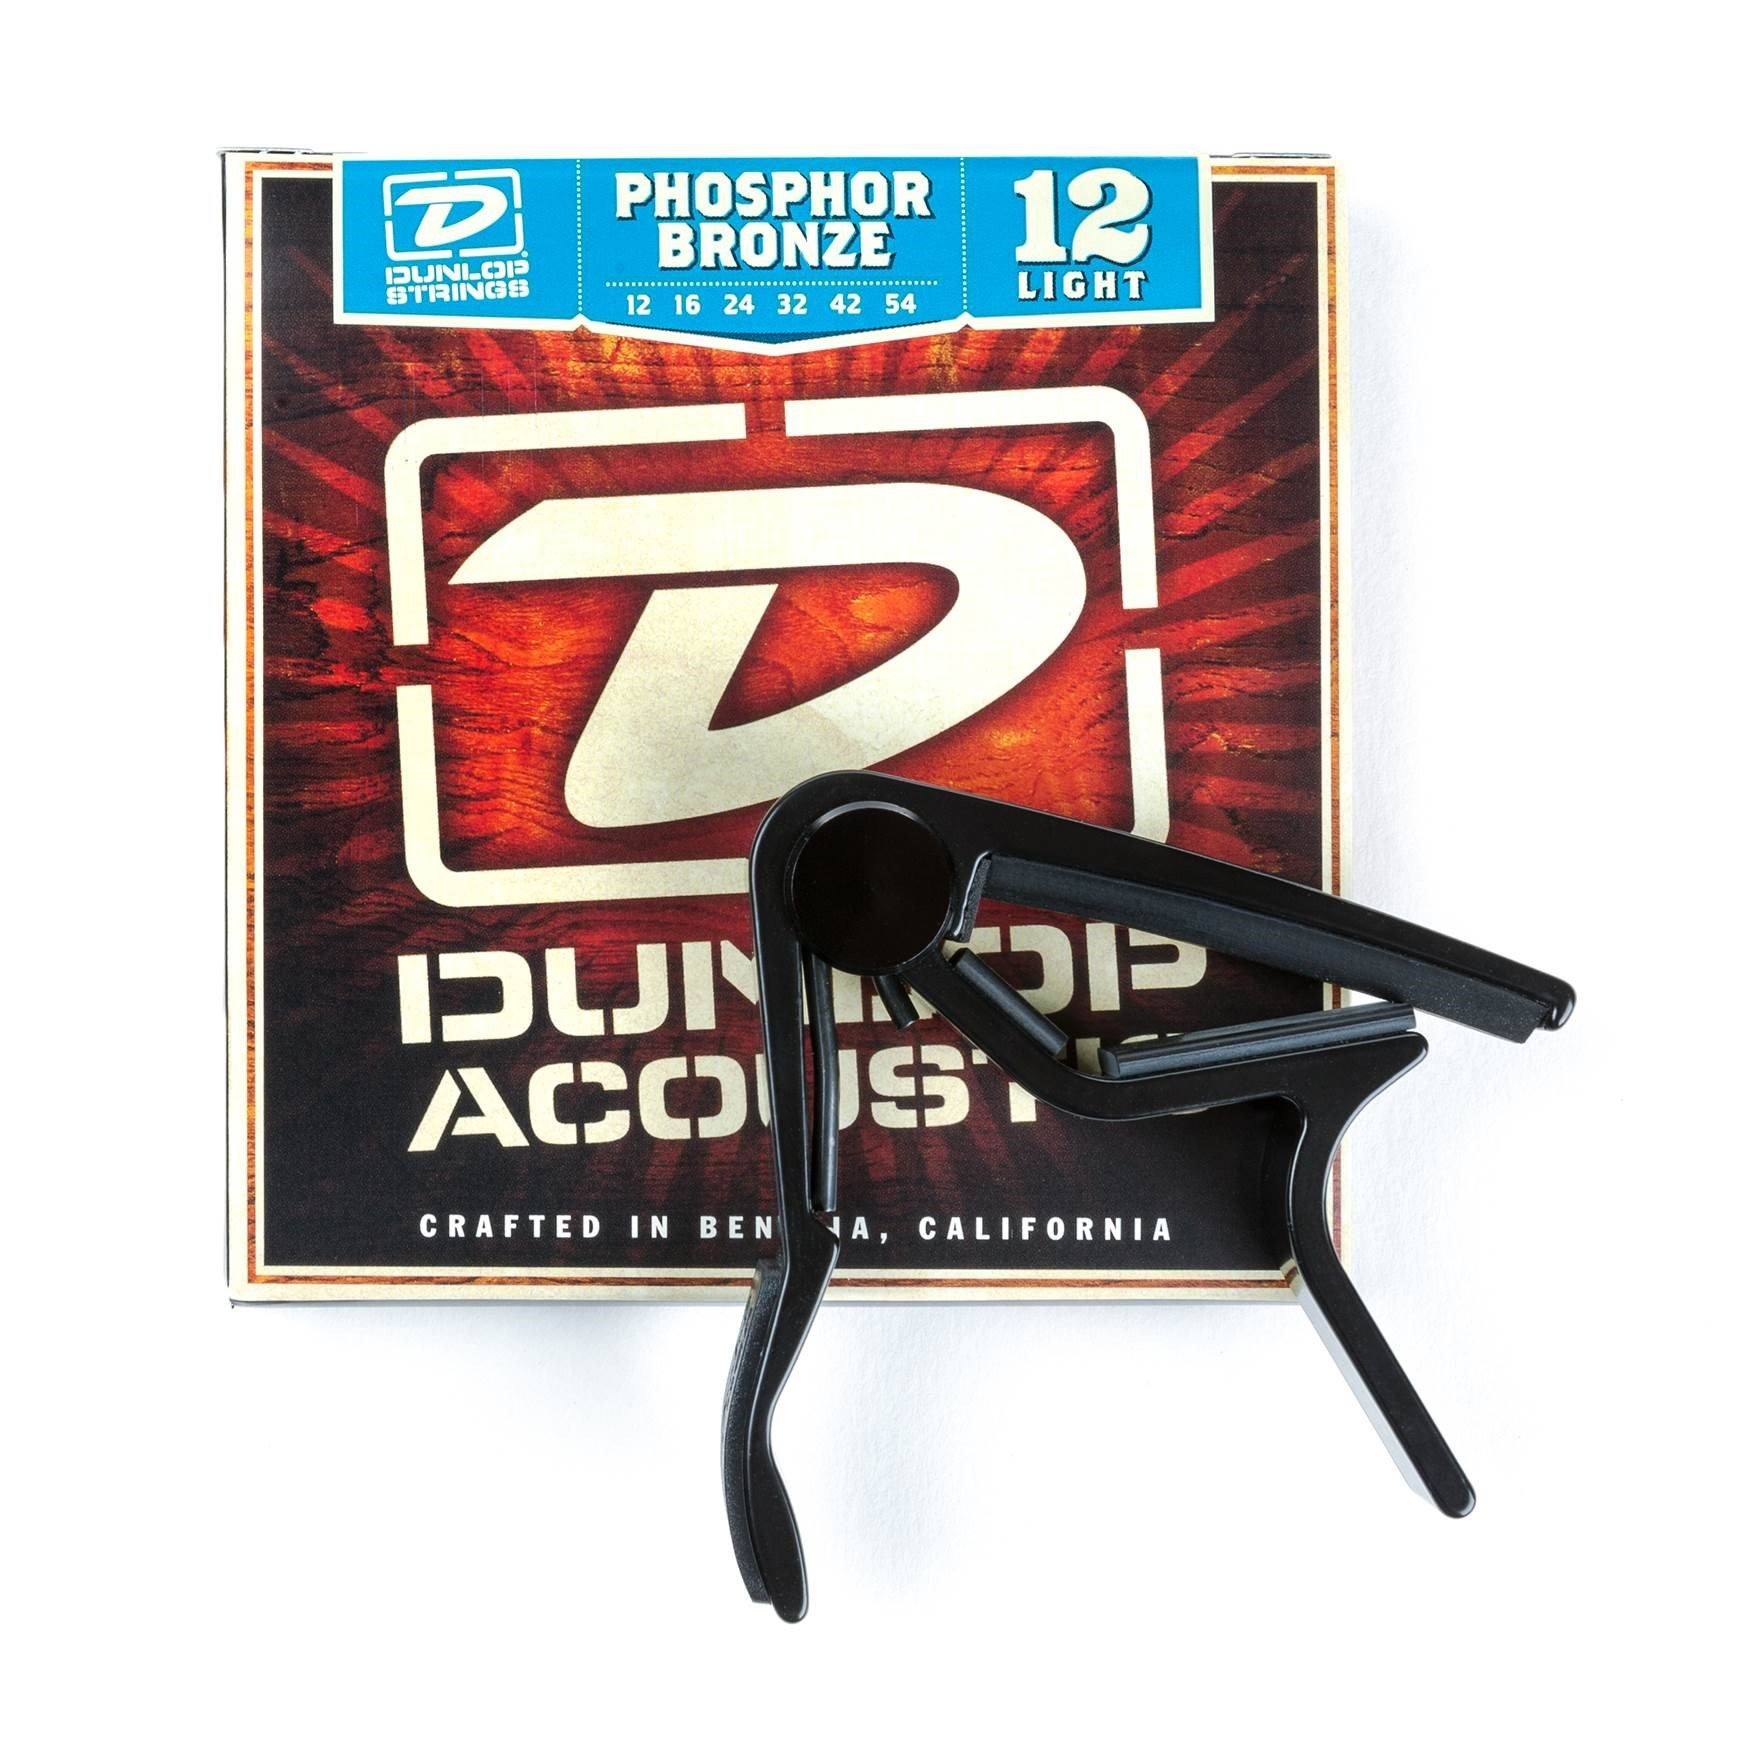 Dunlop 83CBA12 Acoustic Trigger Capo & Phosphor Bronze Strings Combo Pack